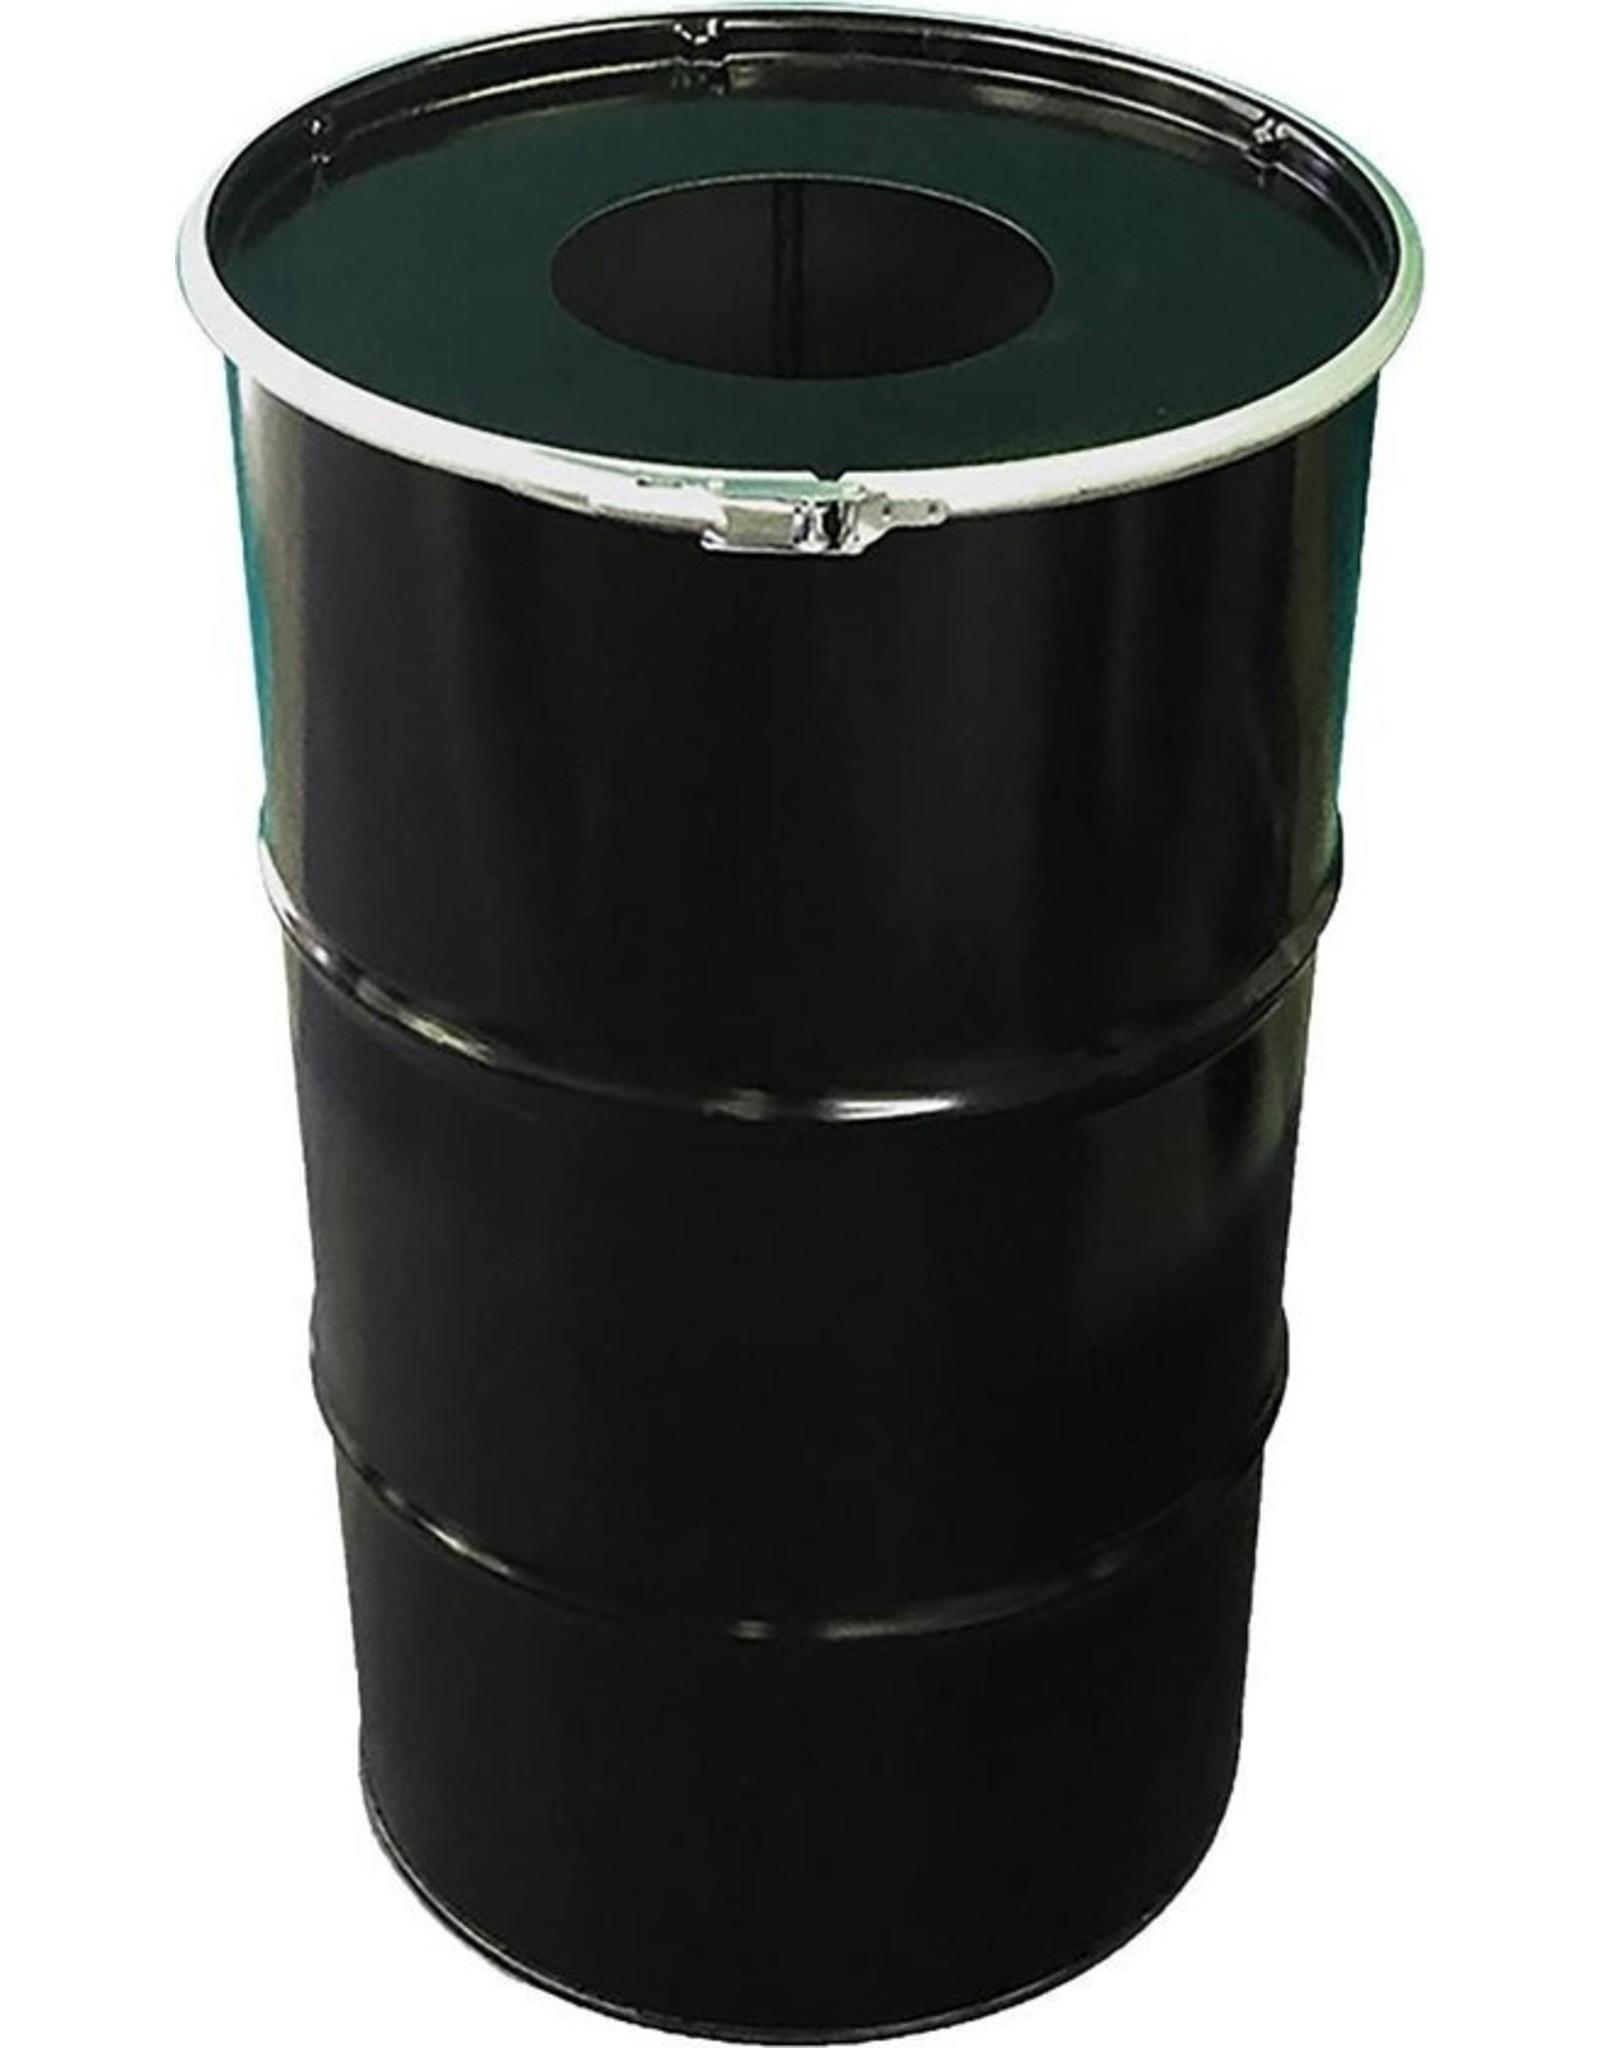 The Binbin BinBin Hole Industriële prullenbak 120 Liter met gat in deksel